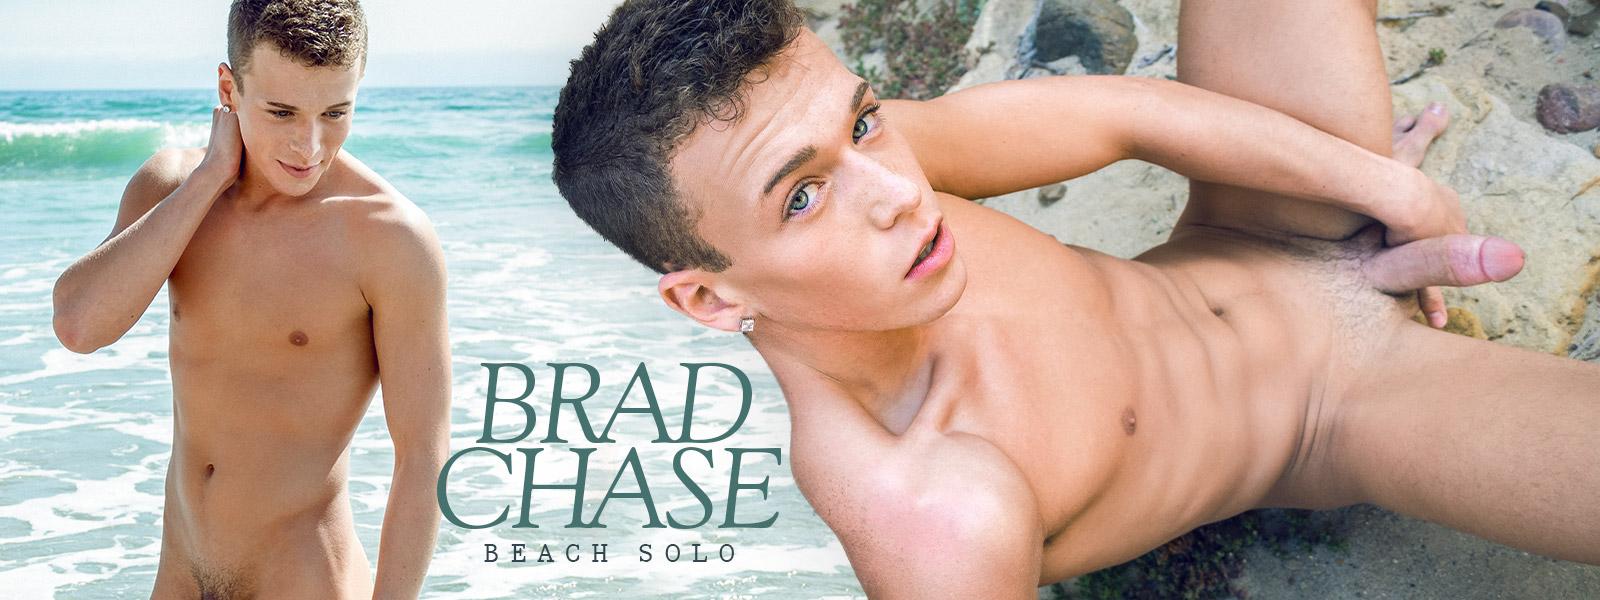 Brad Chase Beach Solo